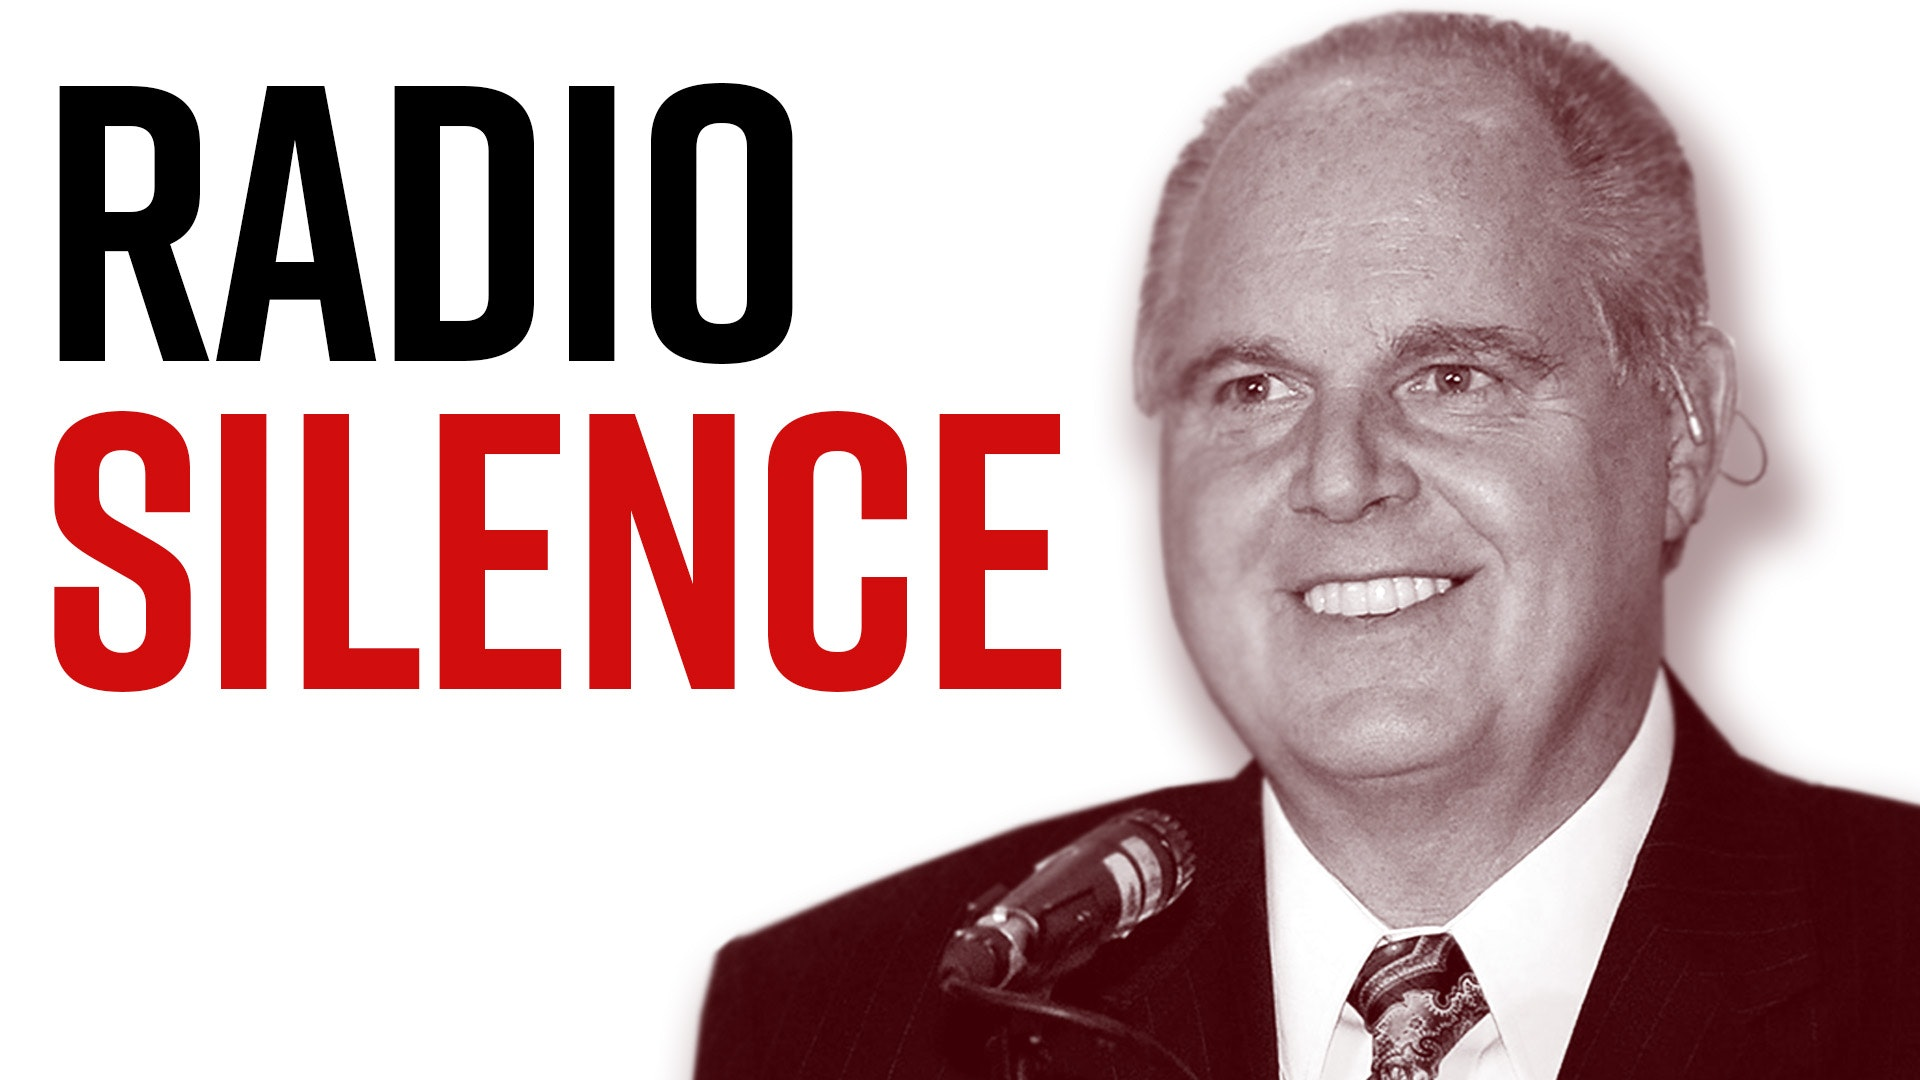 Ep. 1019 - Radio Silence